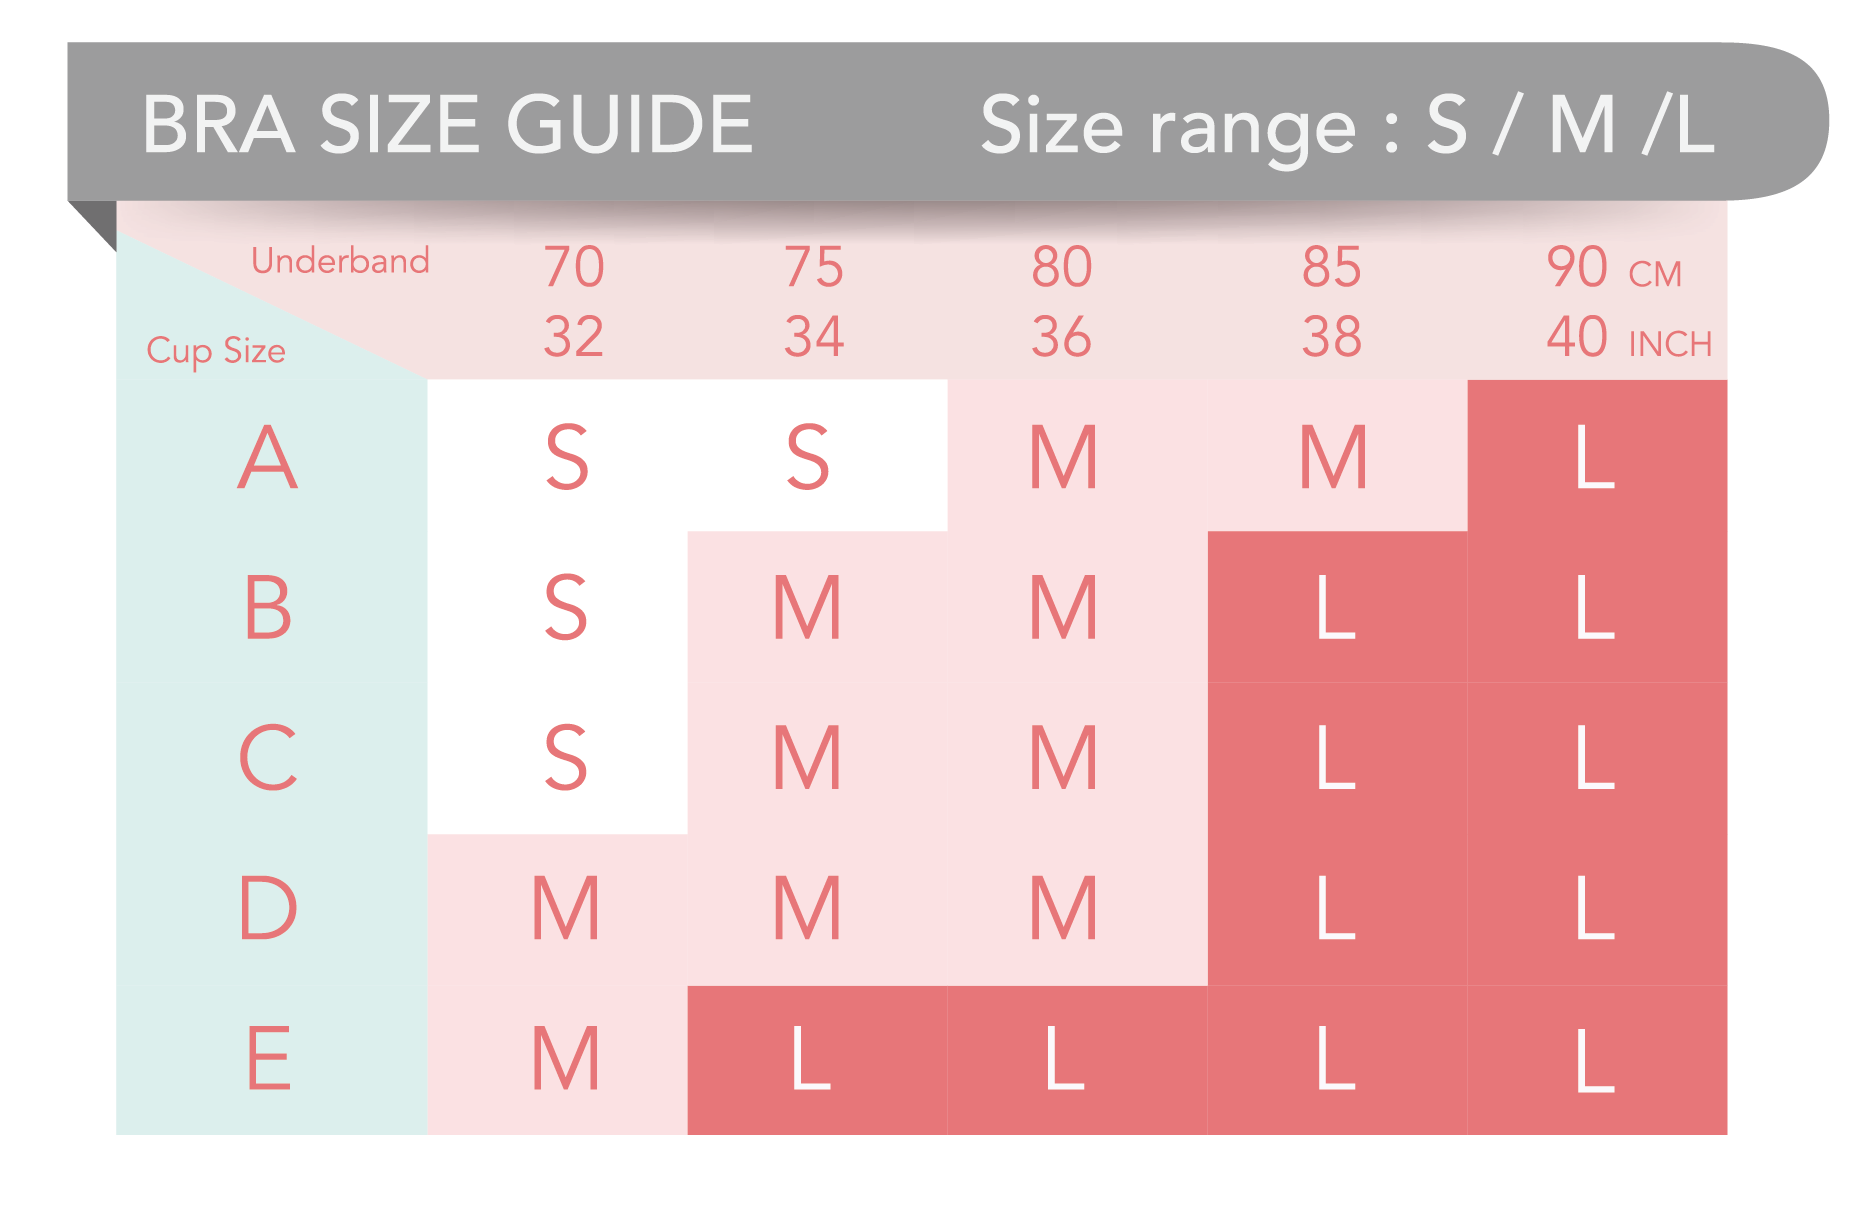 Maternity Bra Size Guide